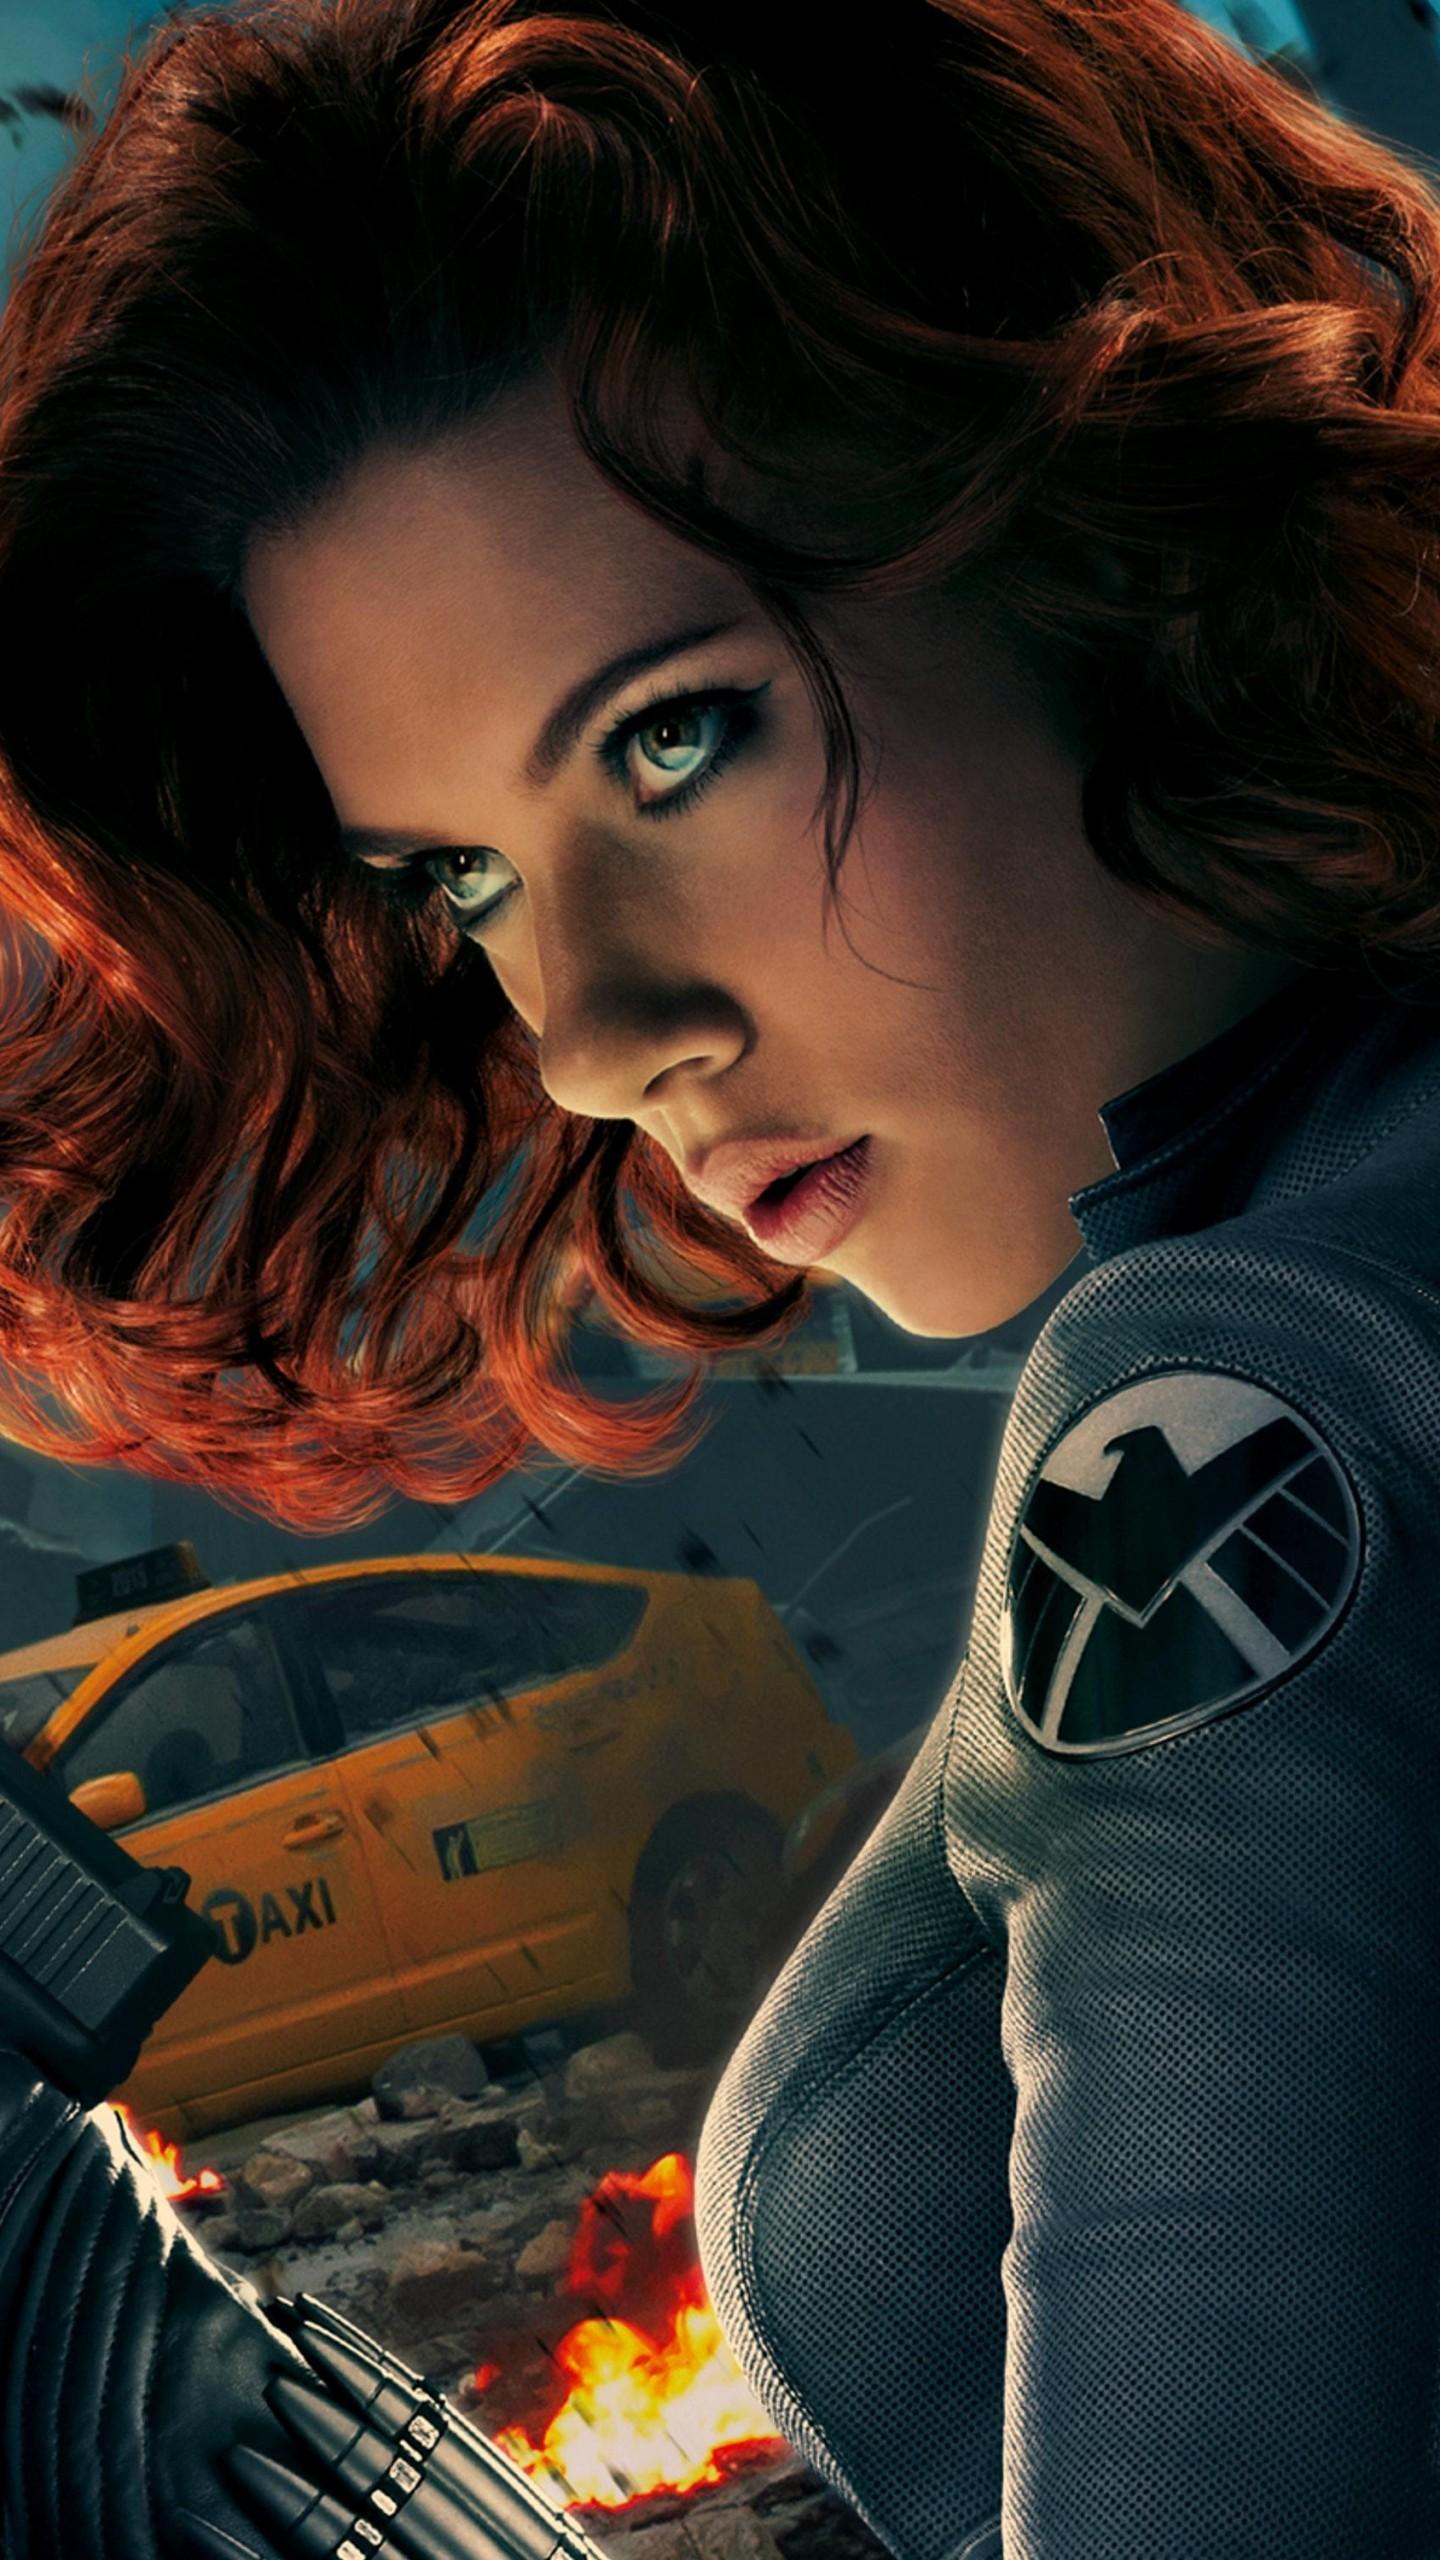 Wallpaper Black Widow Scarlett Johansson Captain America 3 Civil War Marvel Best Movies Of 2016 Movies 10859 Page 3